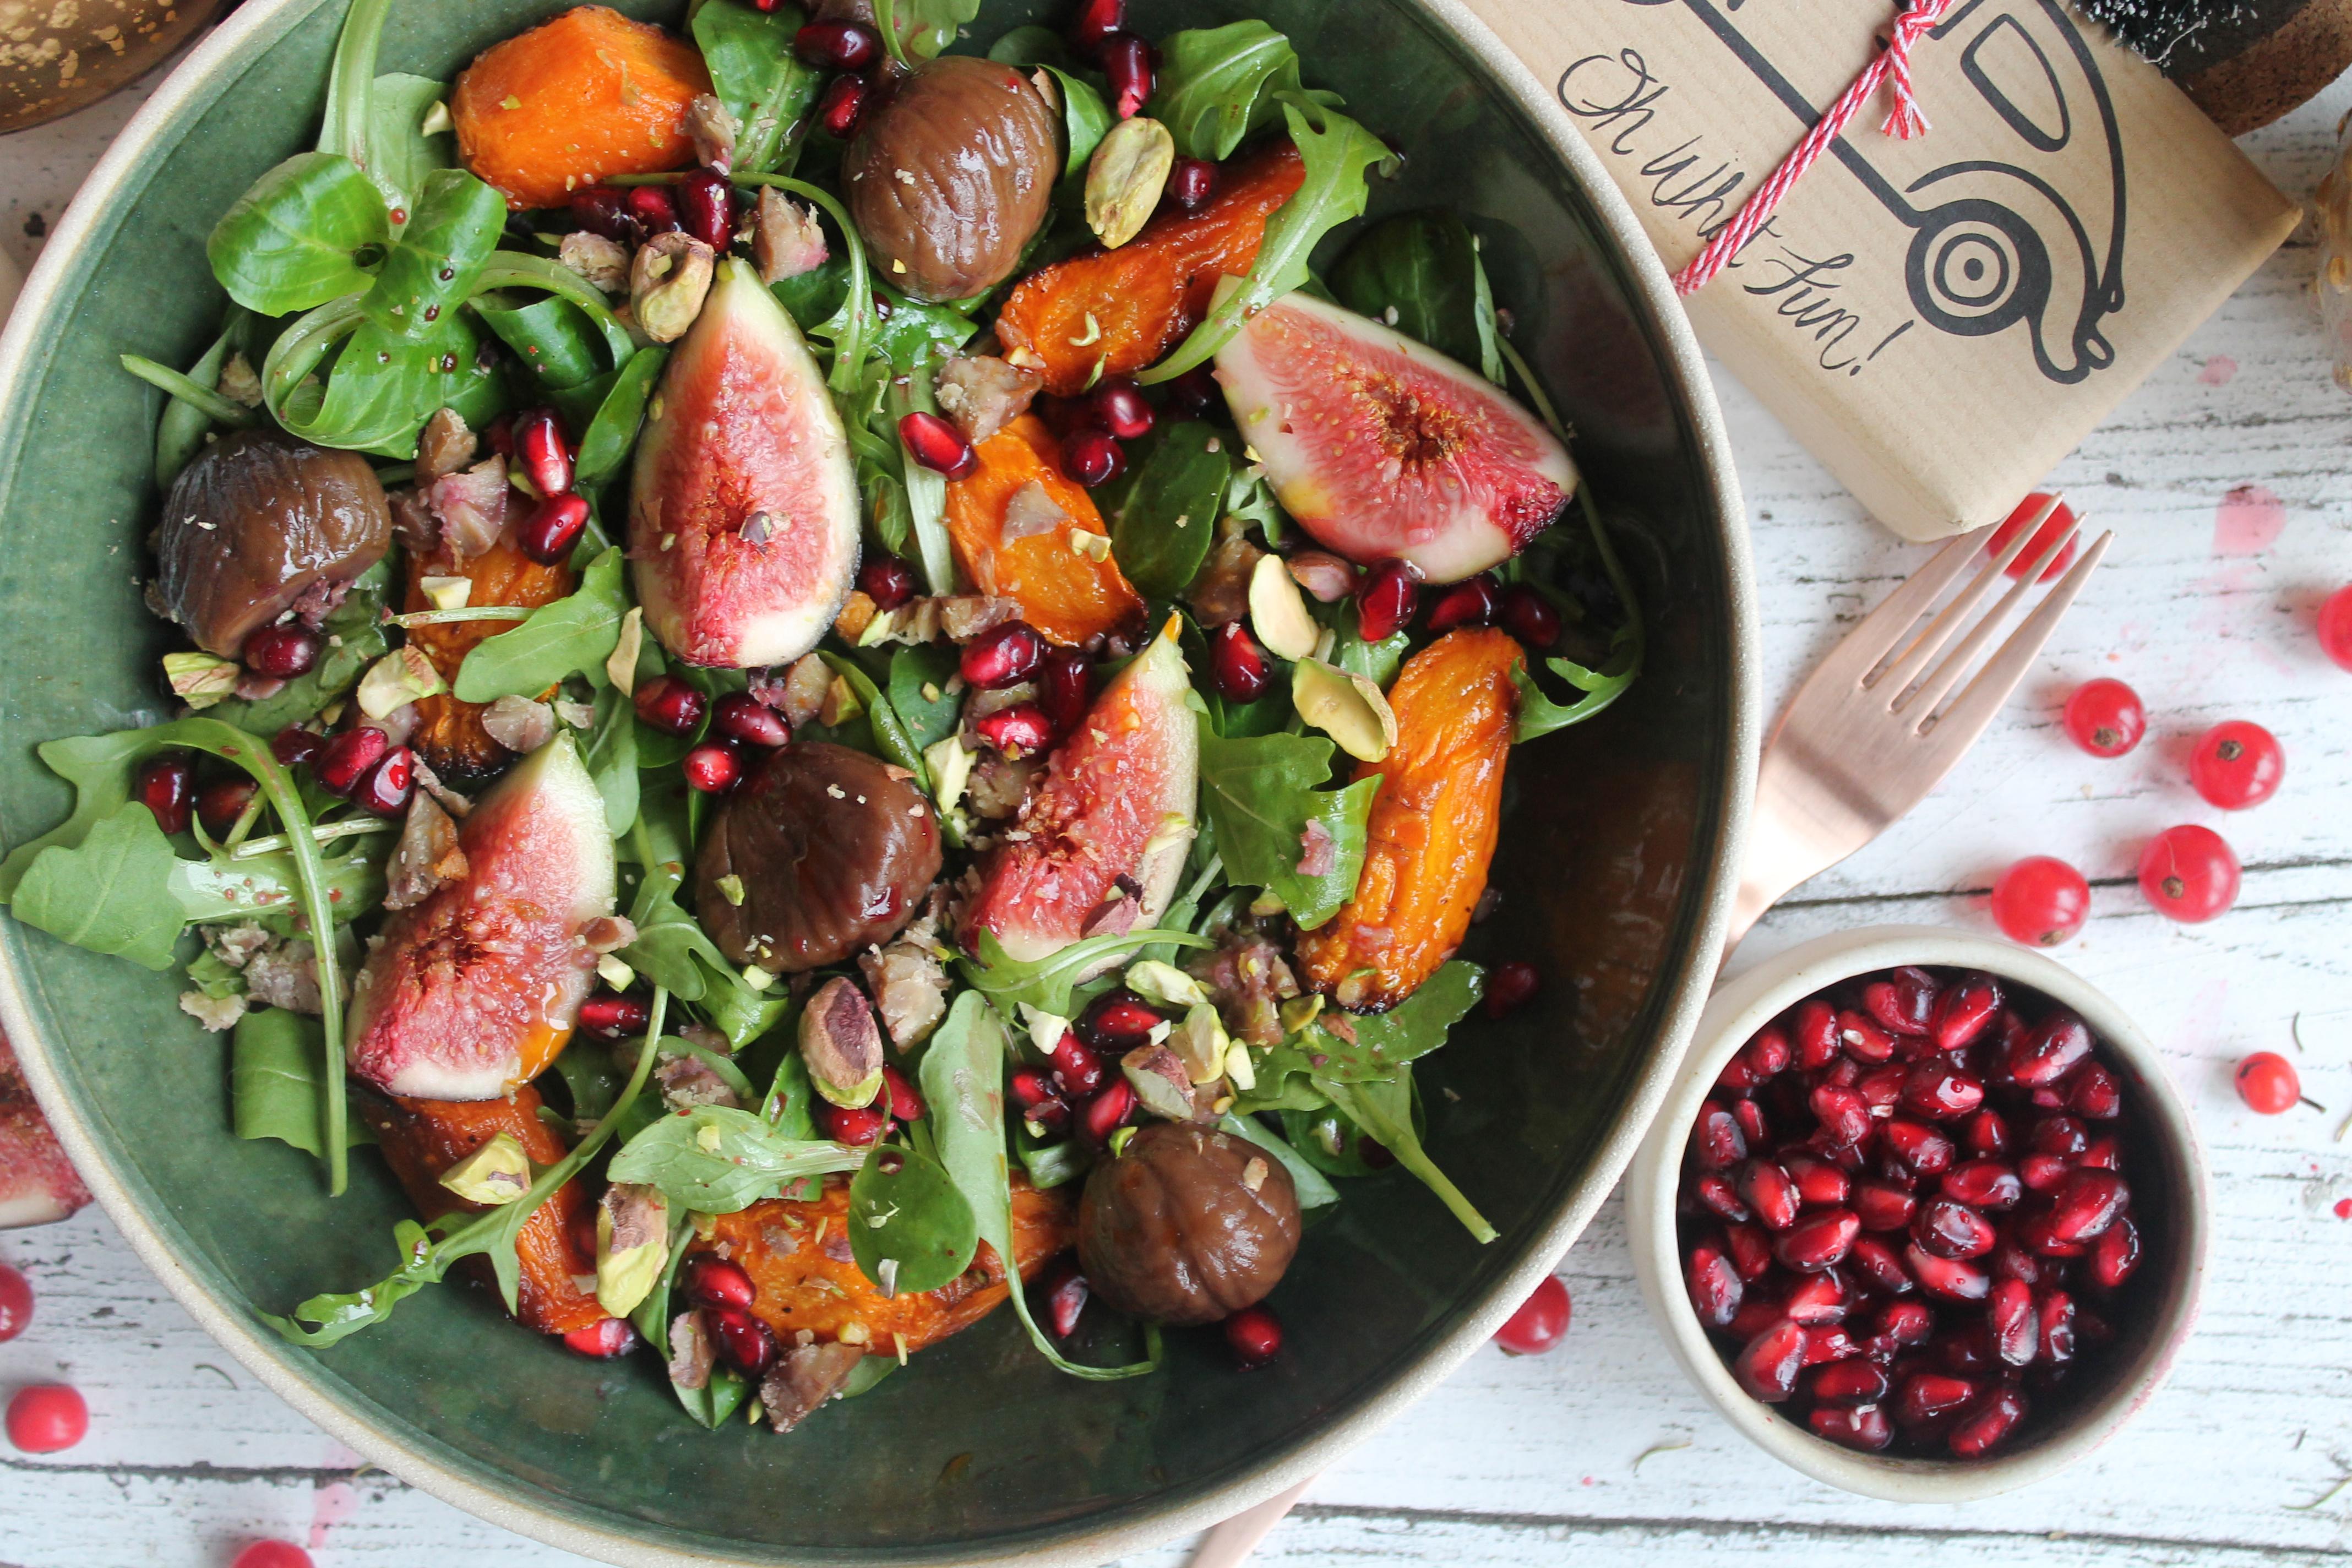 Warm Carrots, Chestnut & Figs Festive Salad